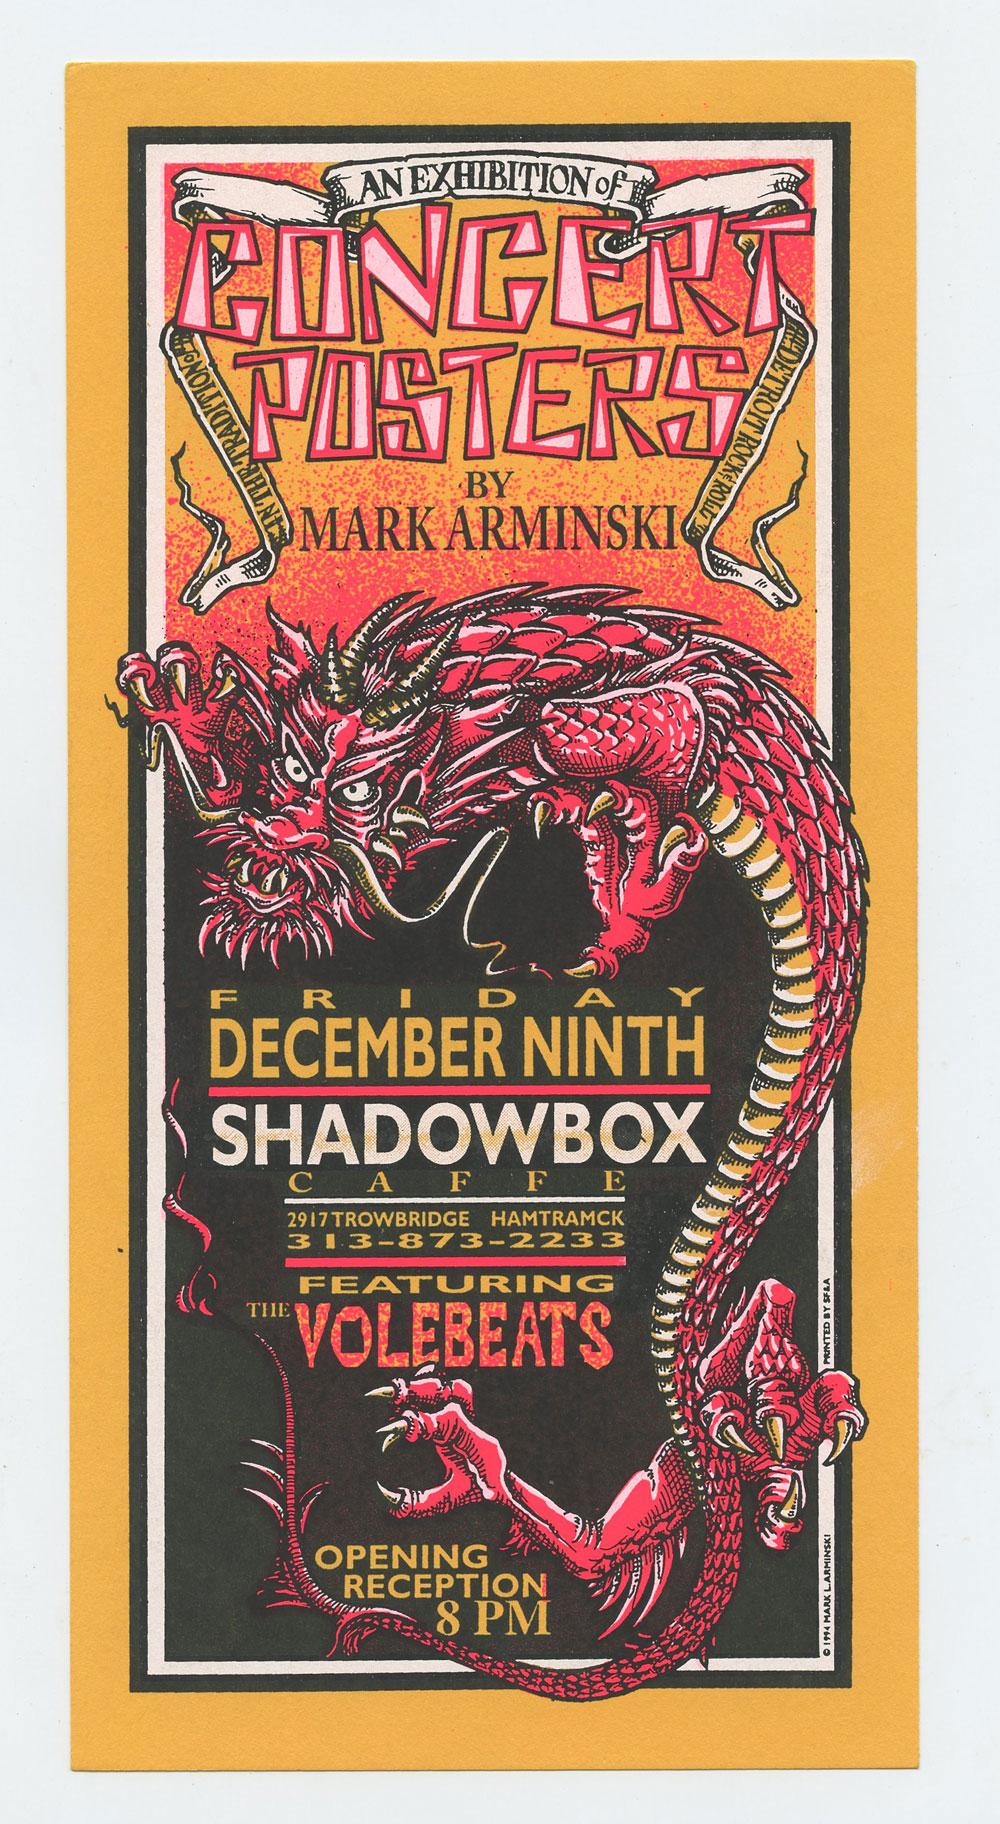 Exhibition of Concert Posters 1994 Dec 9 Handbill Mark Arminski